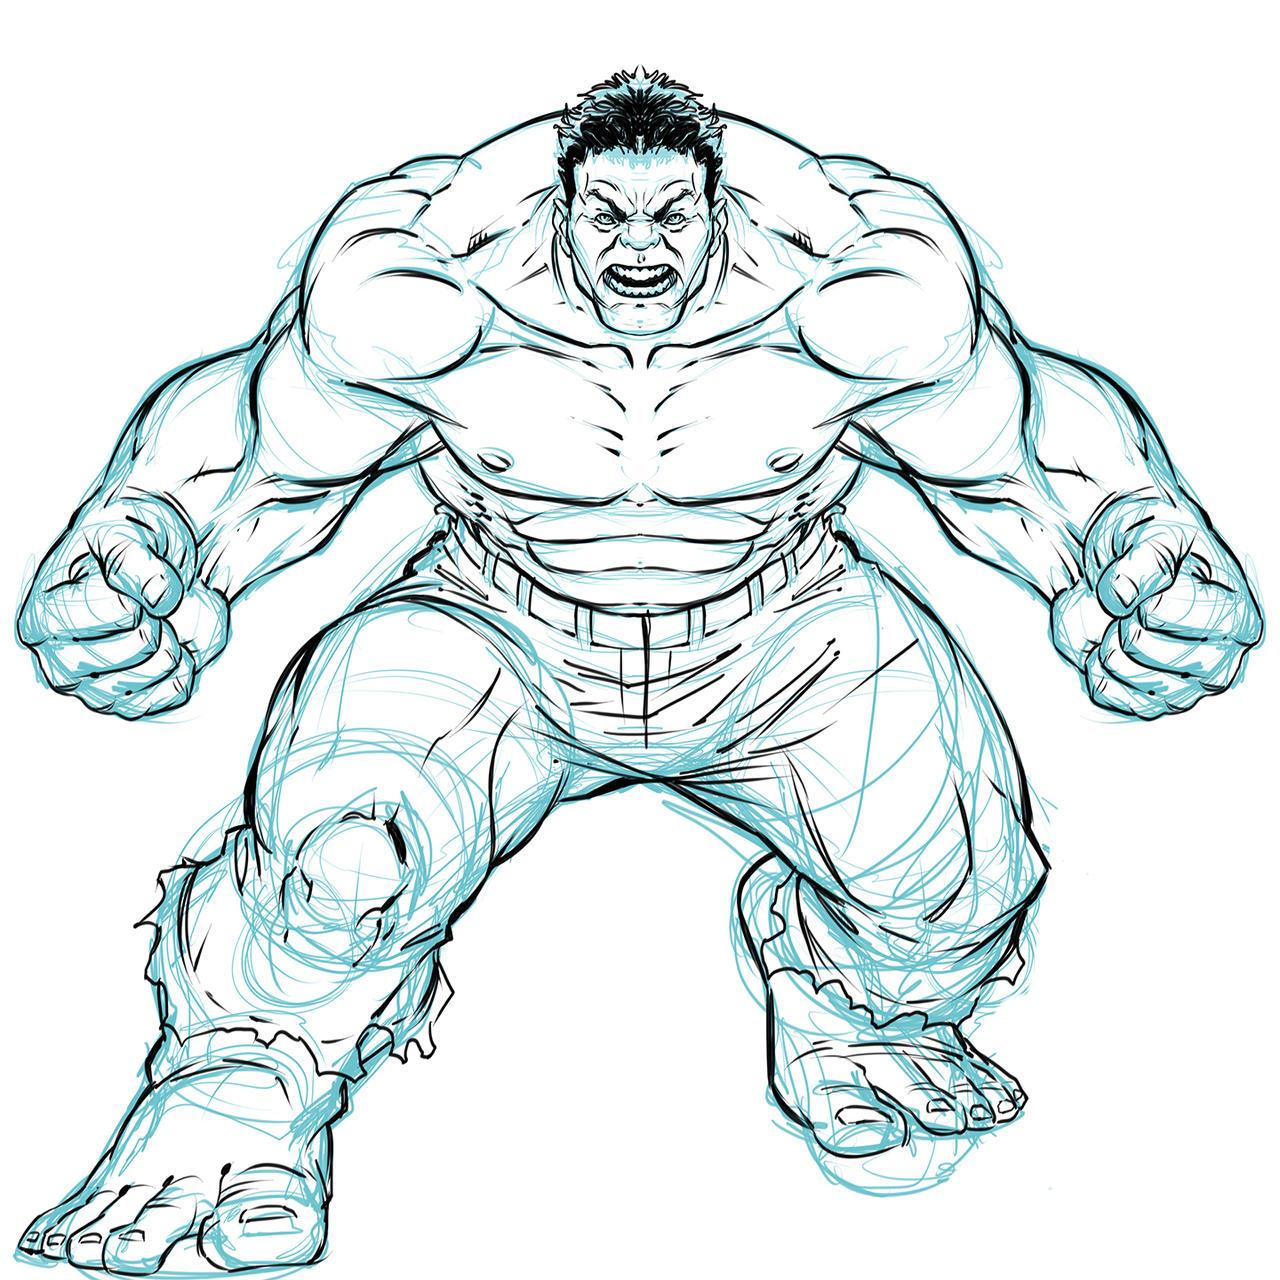 Hulk Sketch By DeonN On DeviantArt